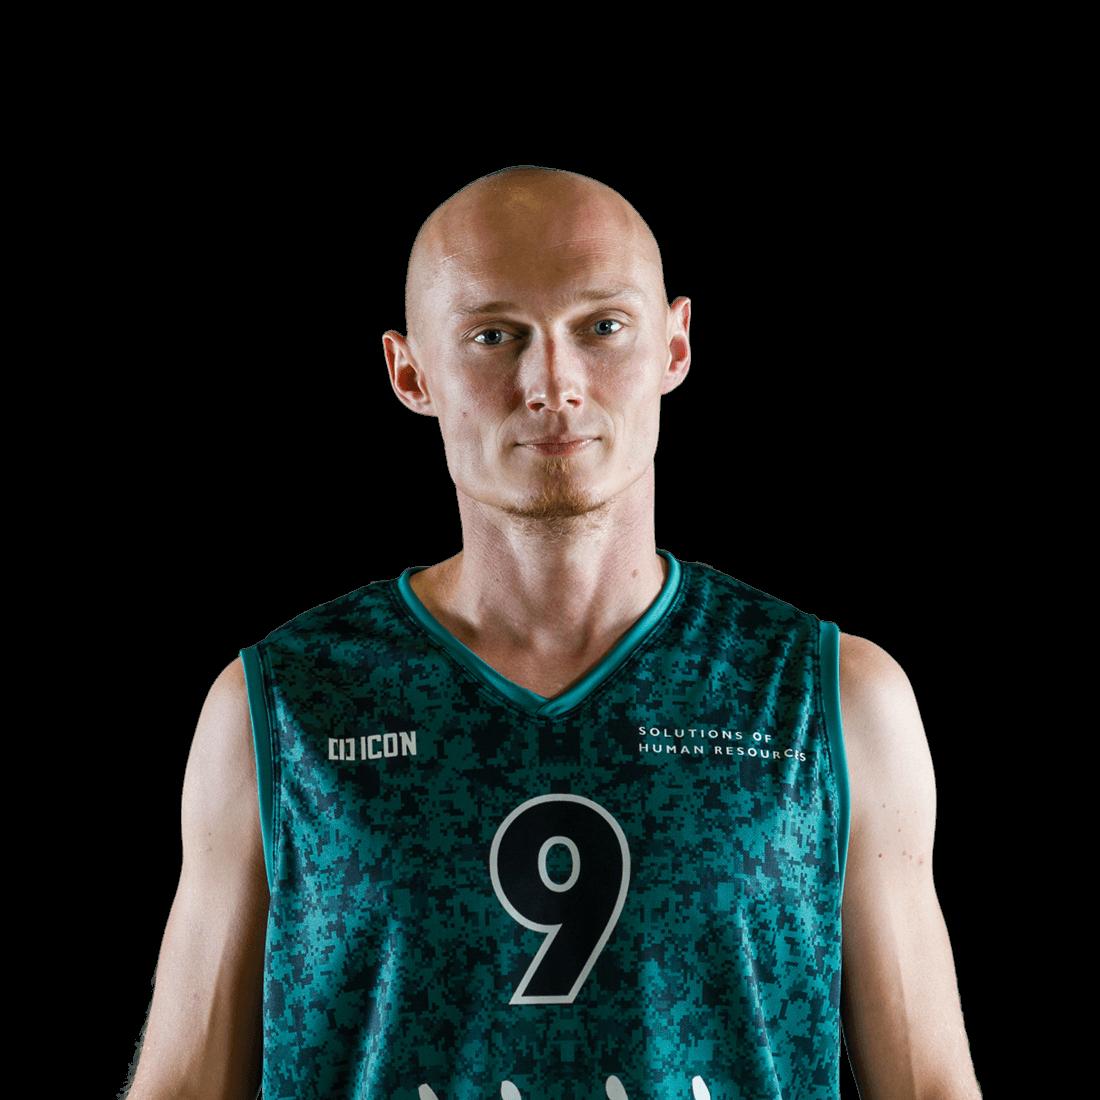 Piotr Jaskólski